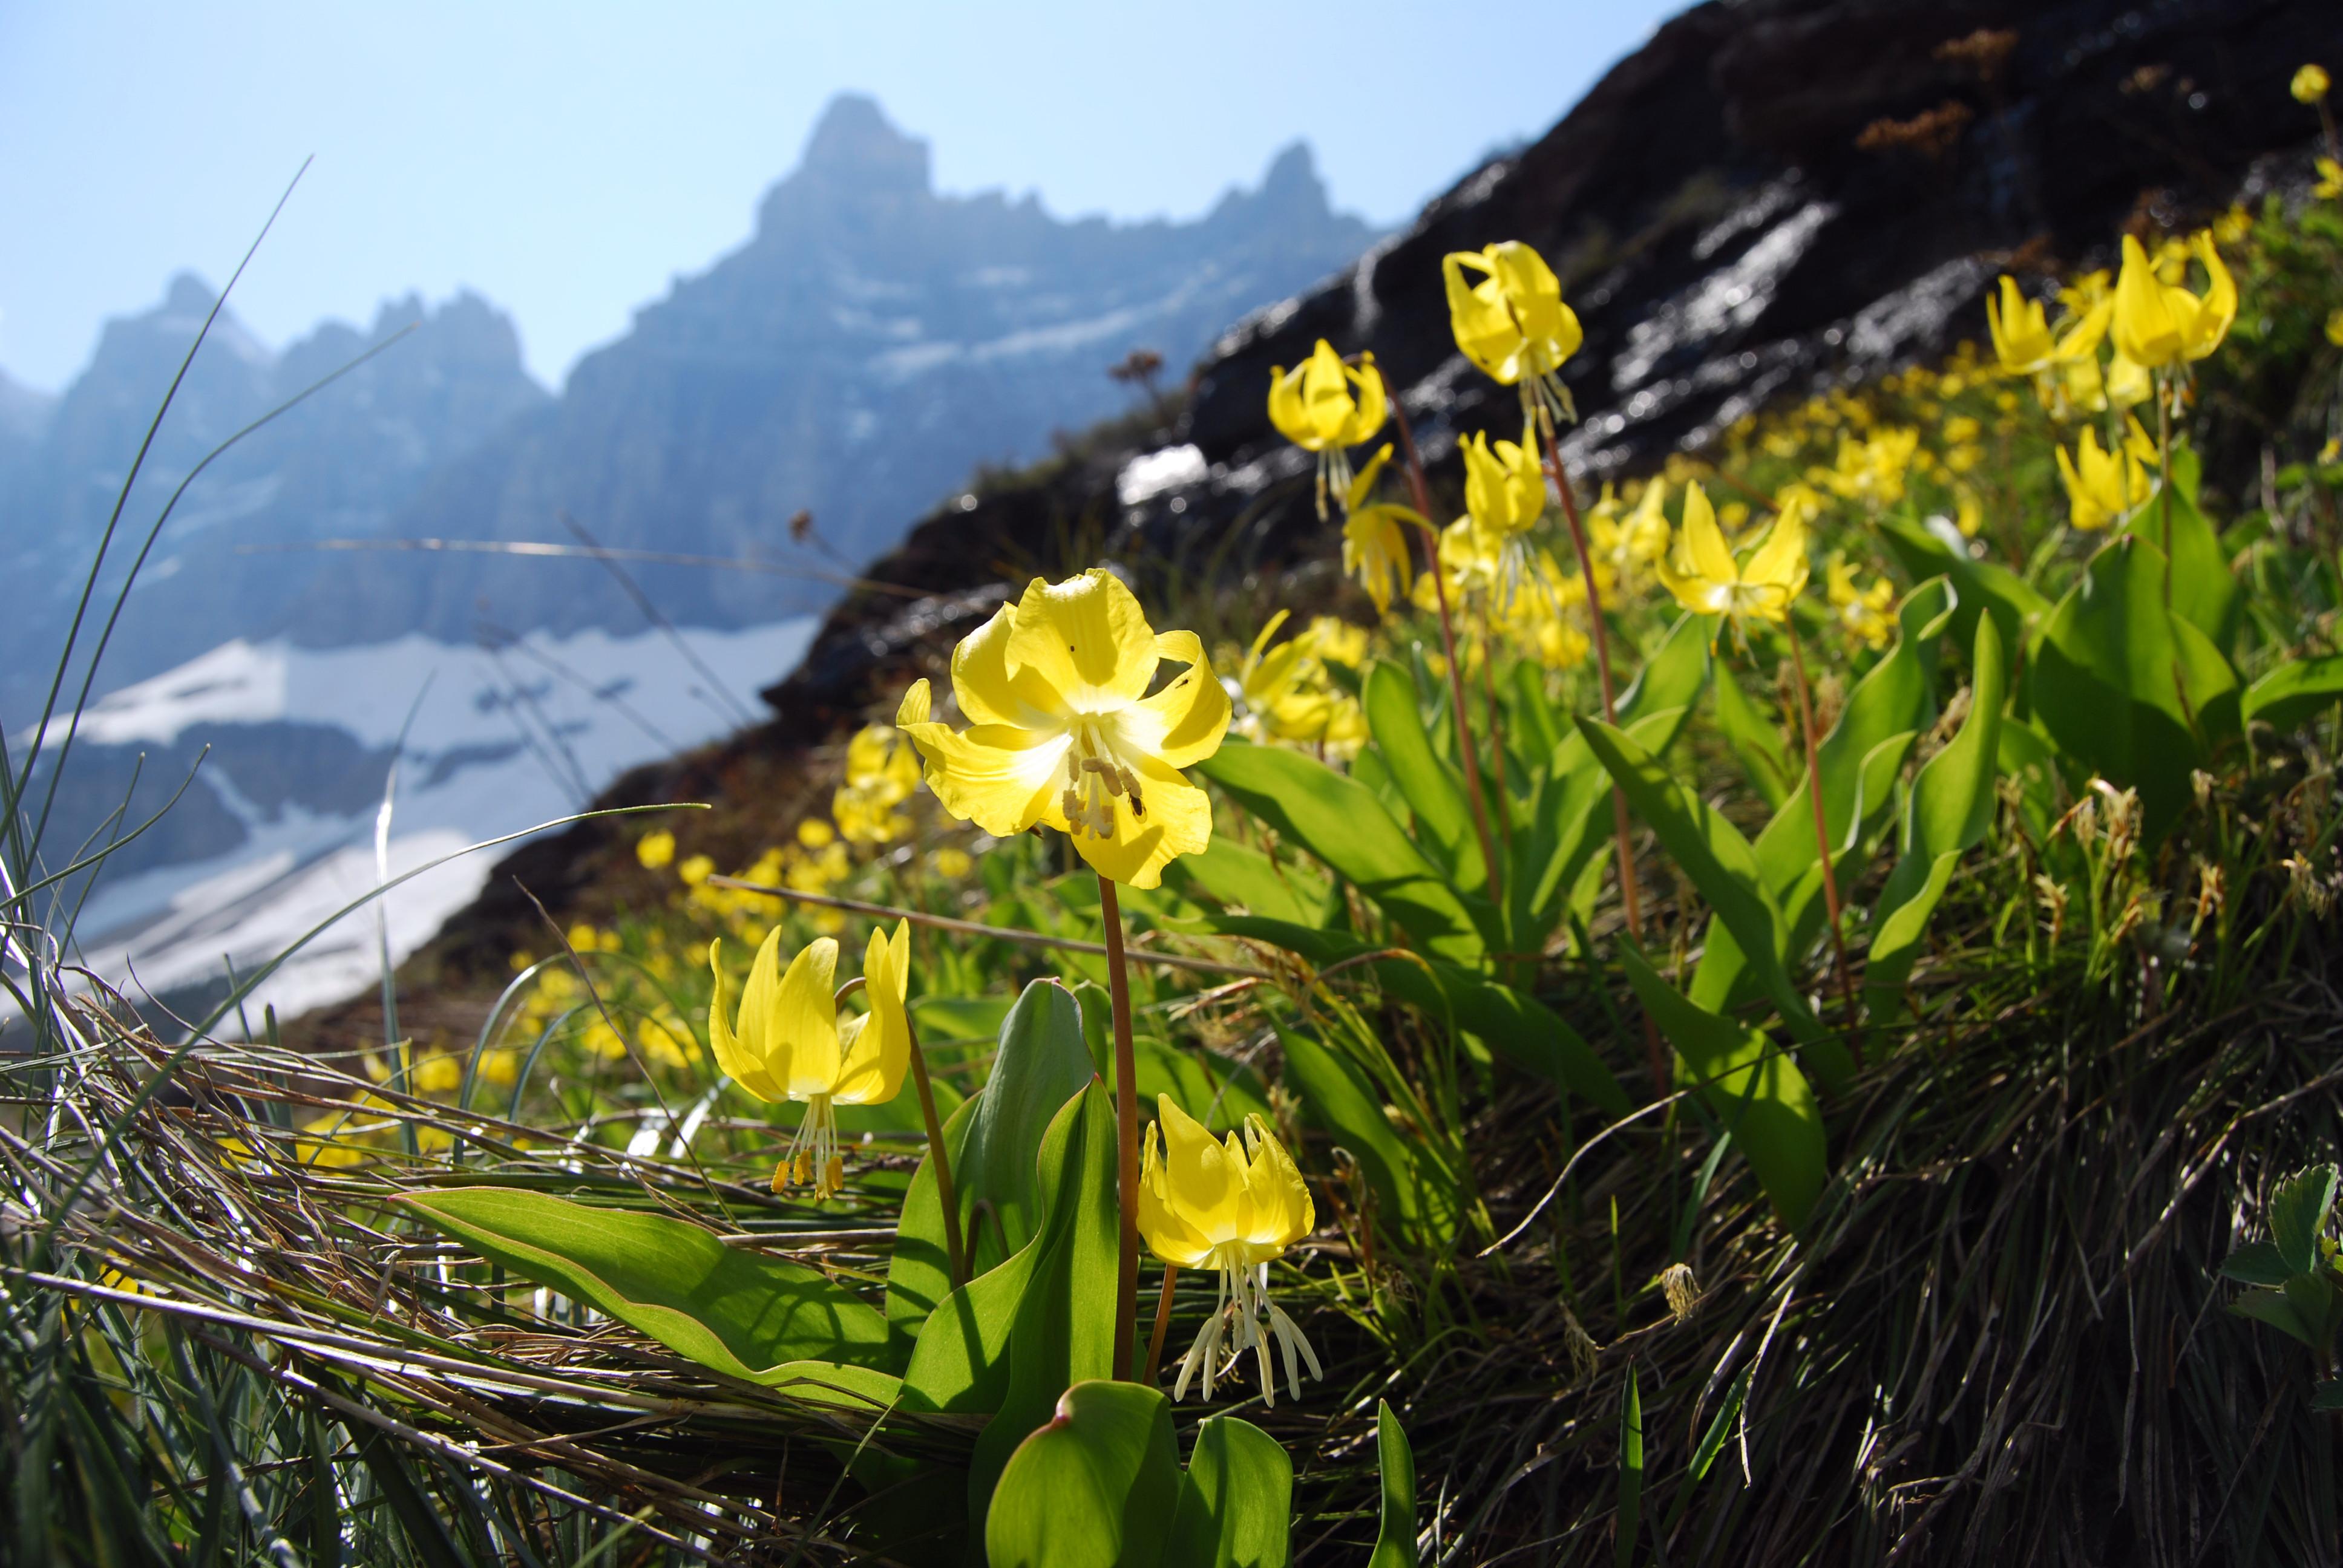 glacier-lillies-glacier-guides